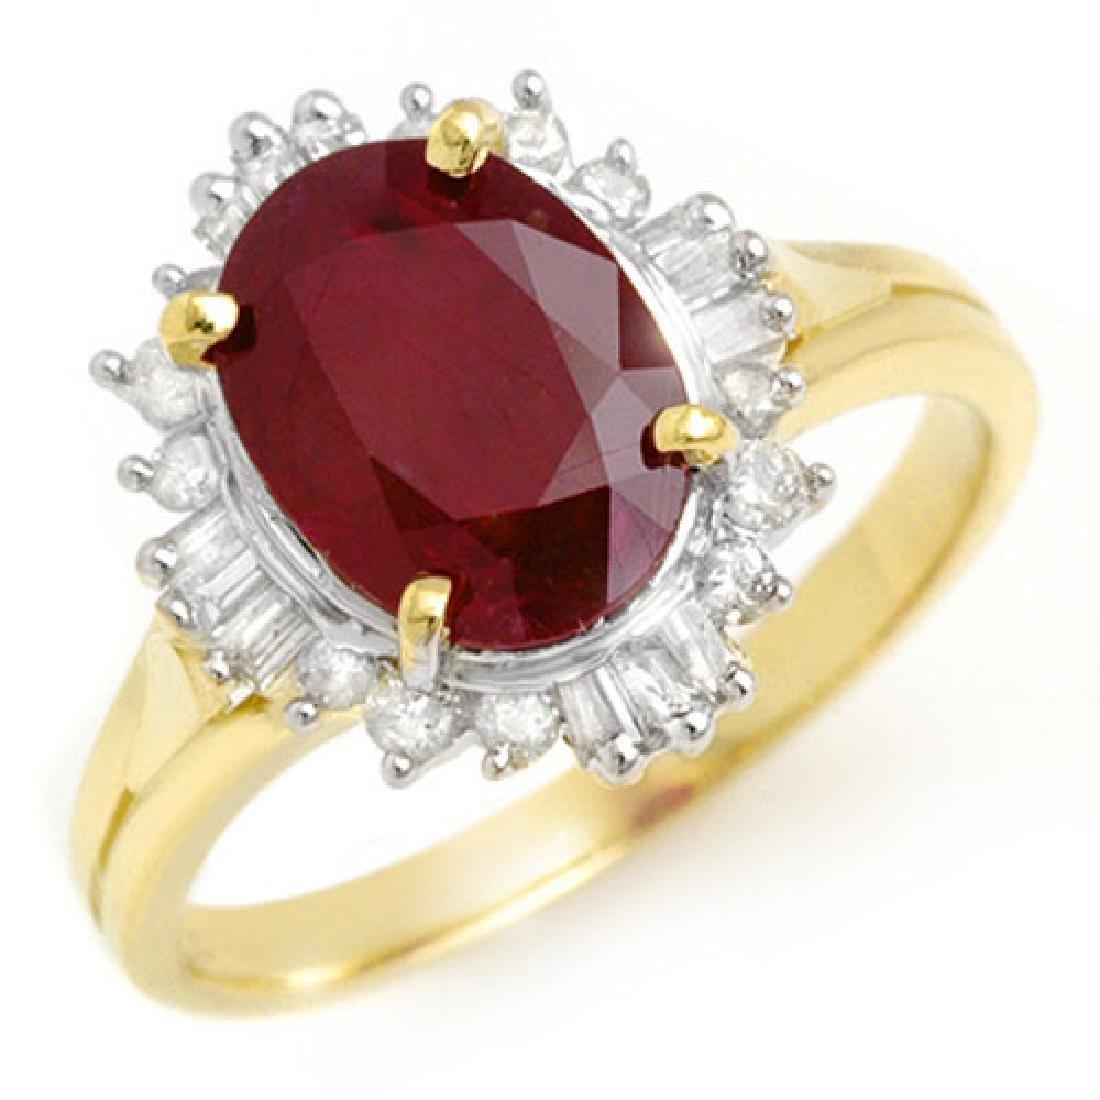 2.55 CTW Ruby & Diamond Ring 10K Yellow Gold